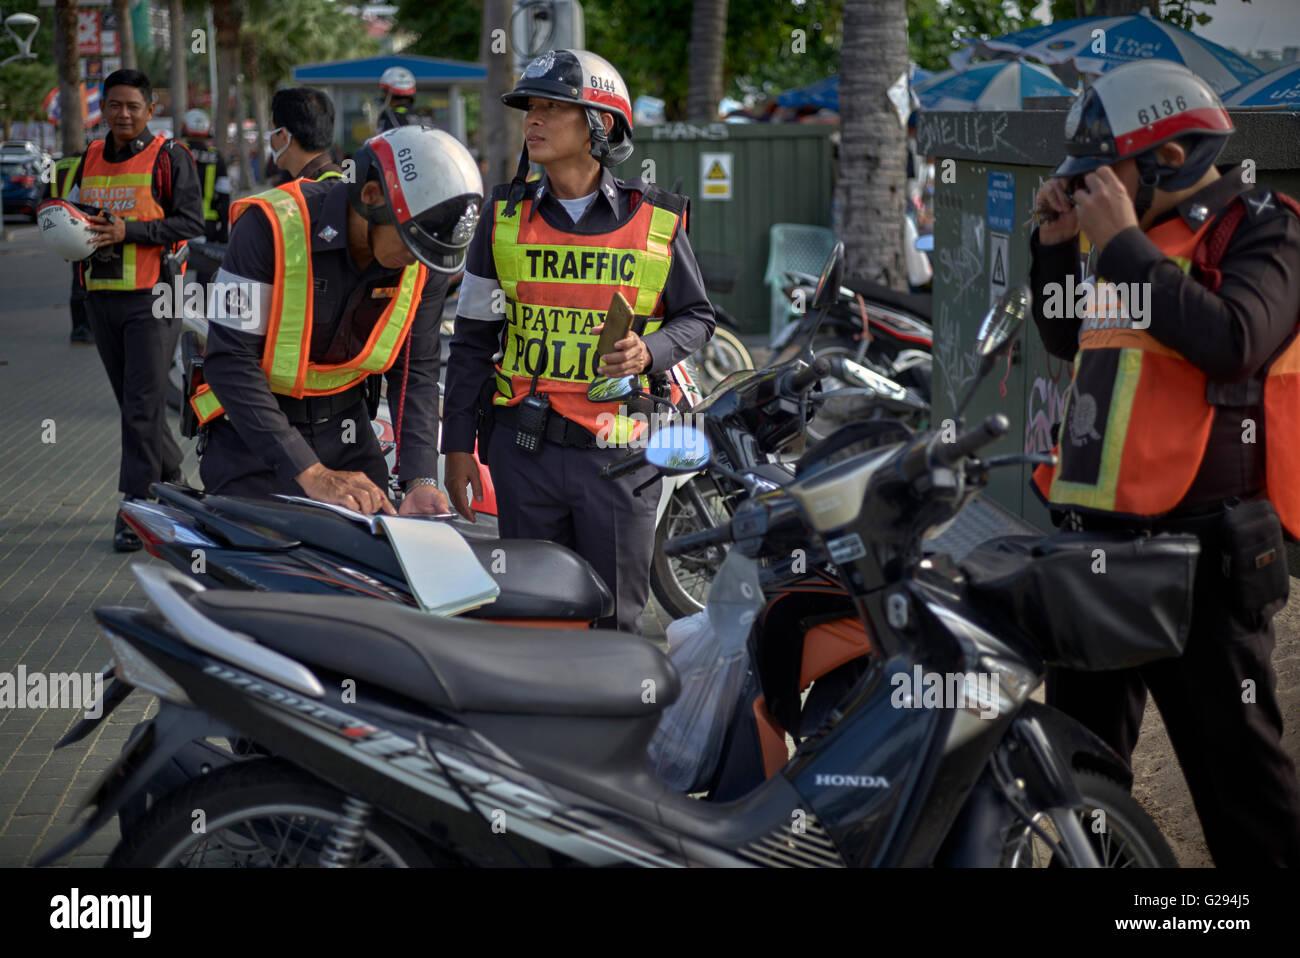 La policía de tráfico de Tailandia. Tailandia S. E. Asia Imagen De Stock